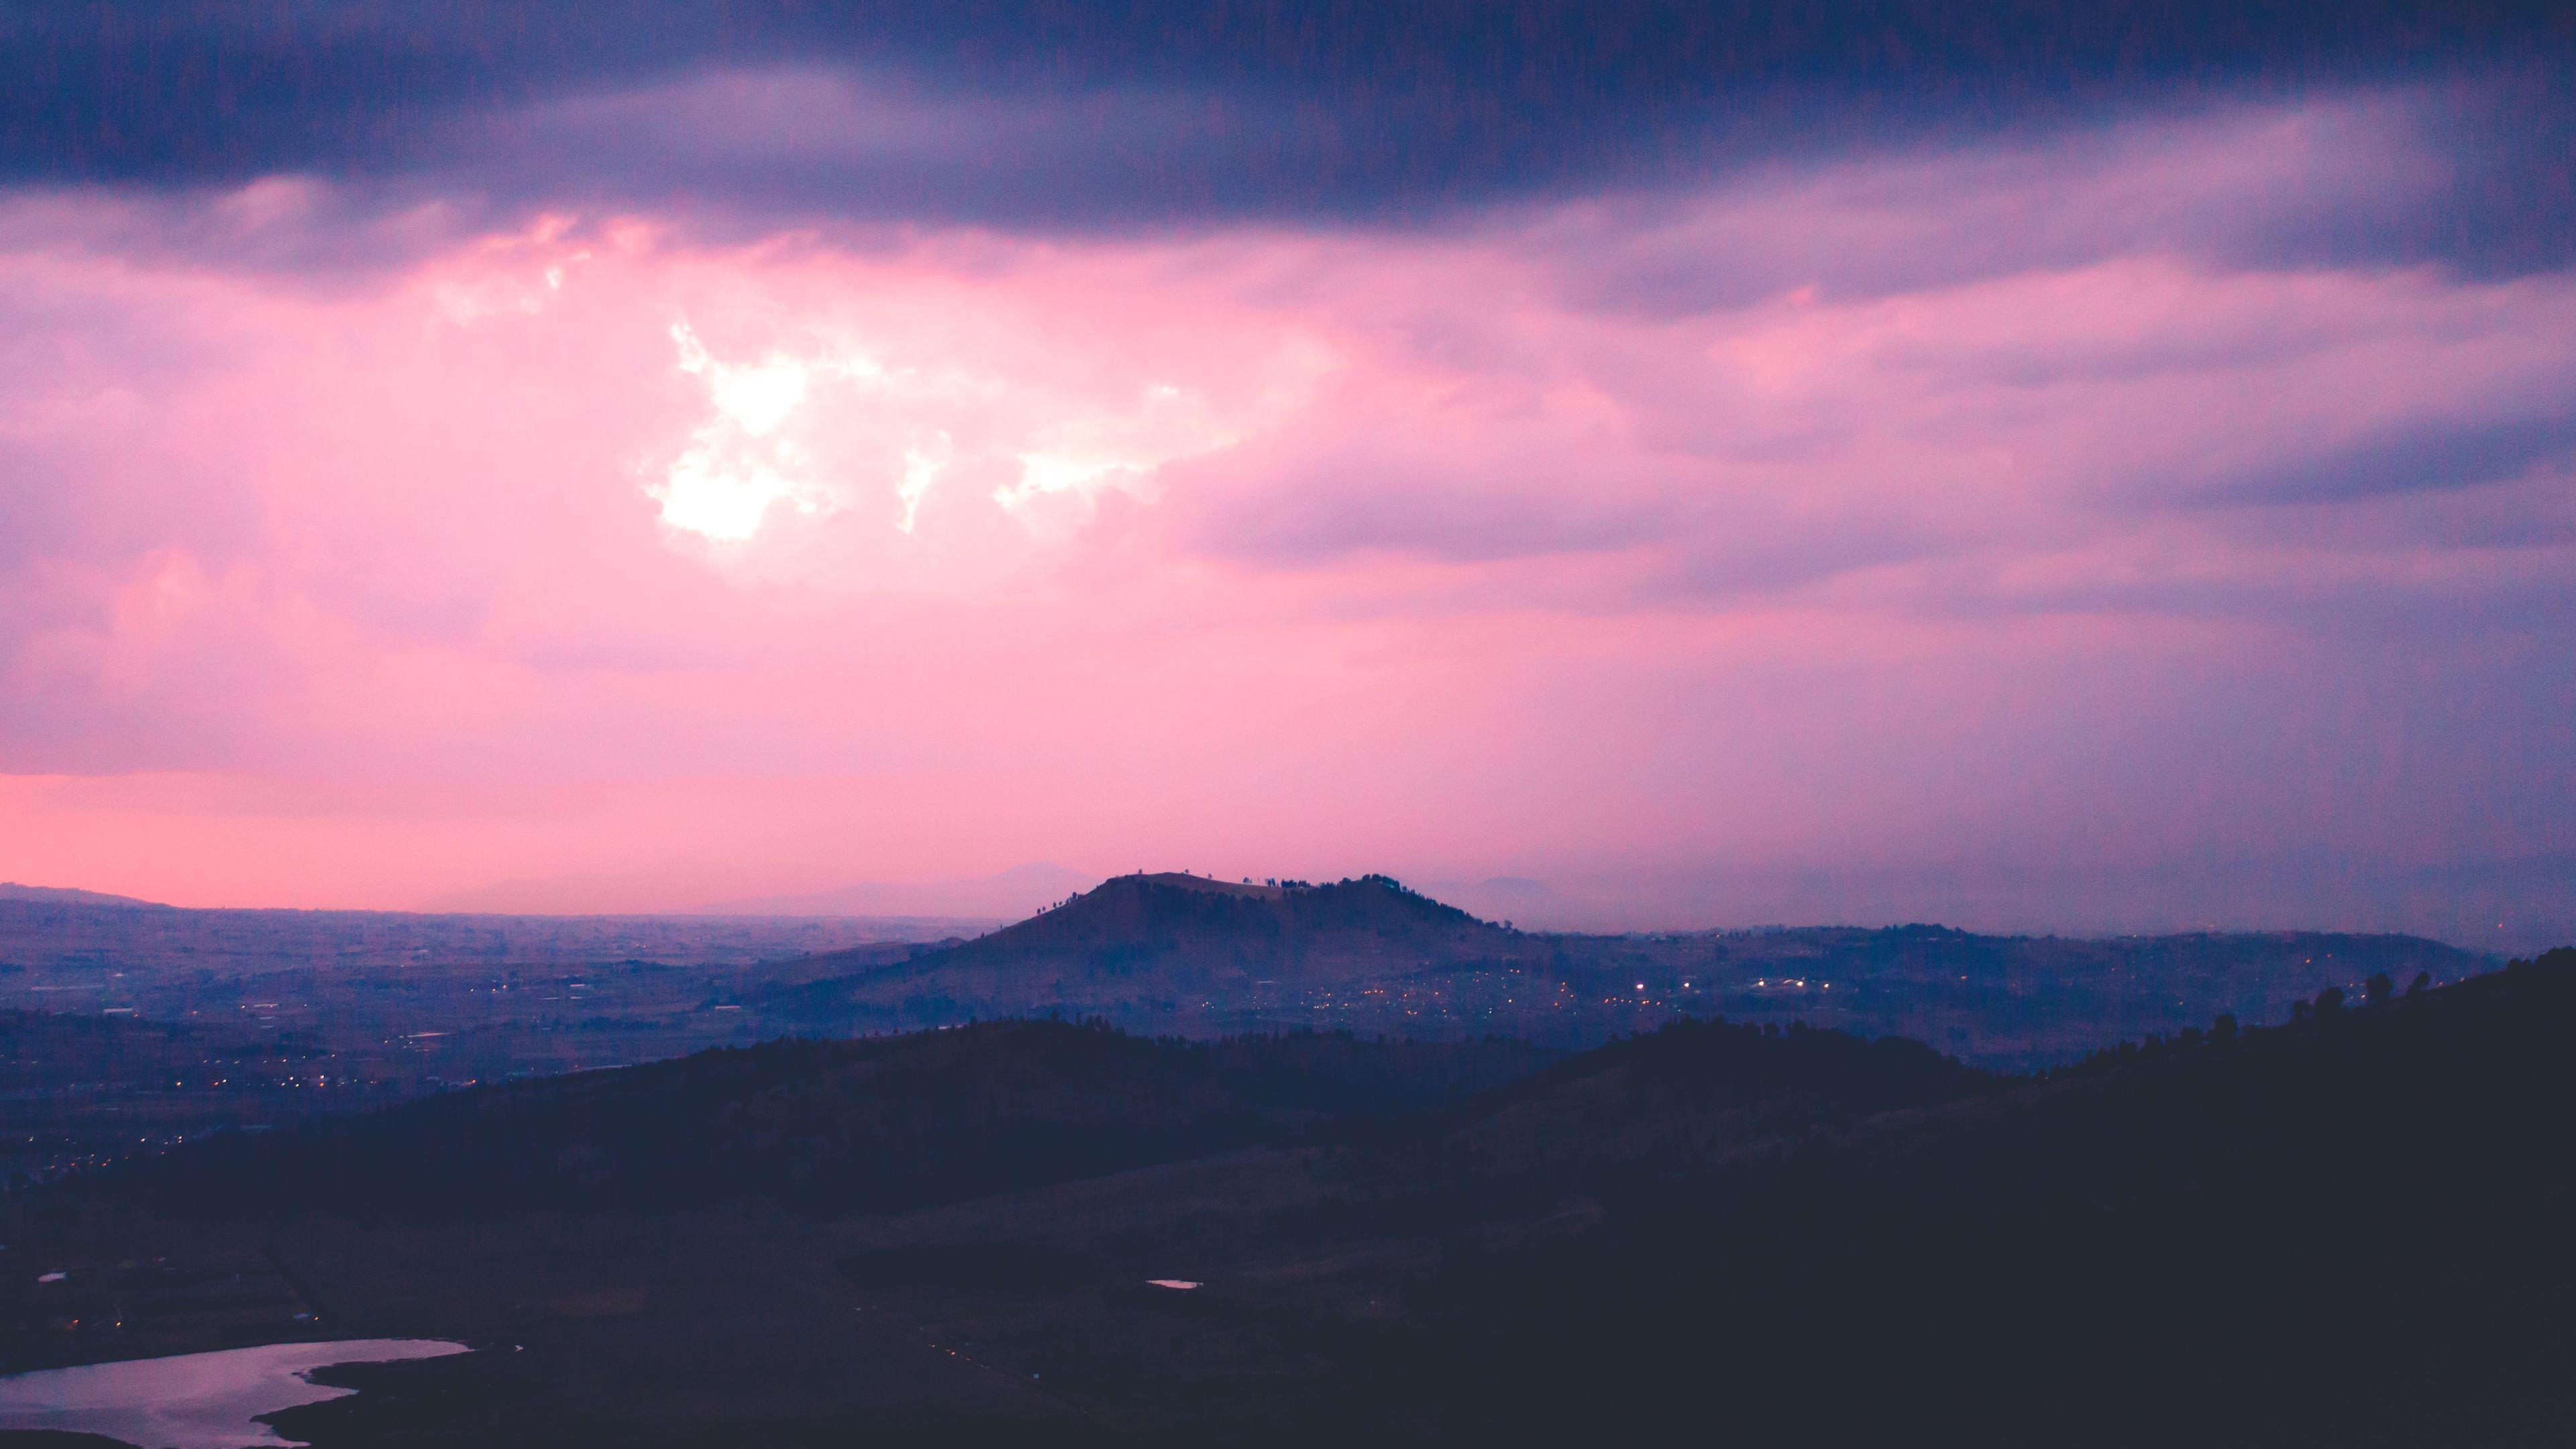 Wallpaper 4k Pink Sky Cloud Mountain 4k 4k Wallpapers Cloud